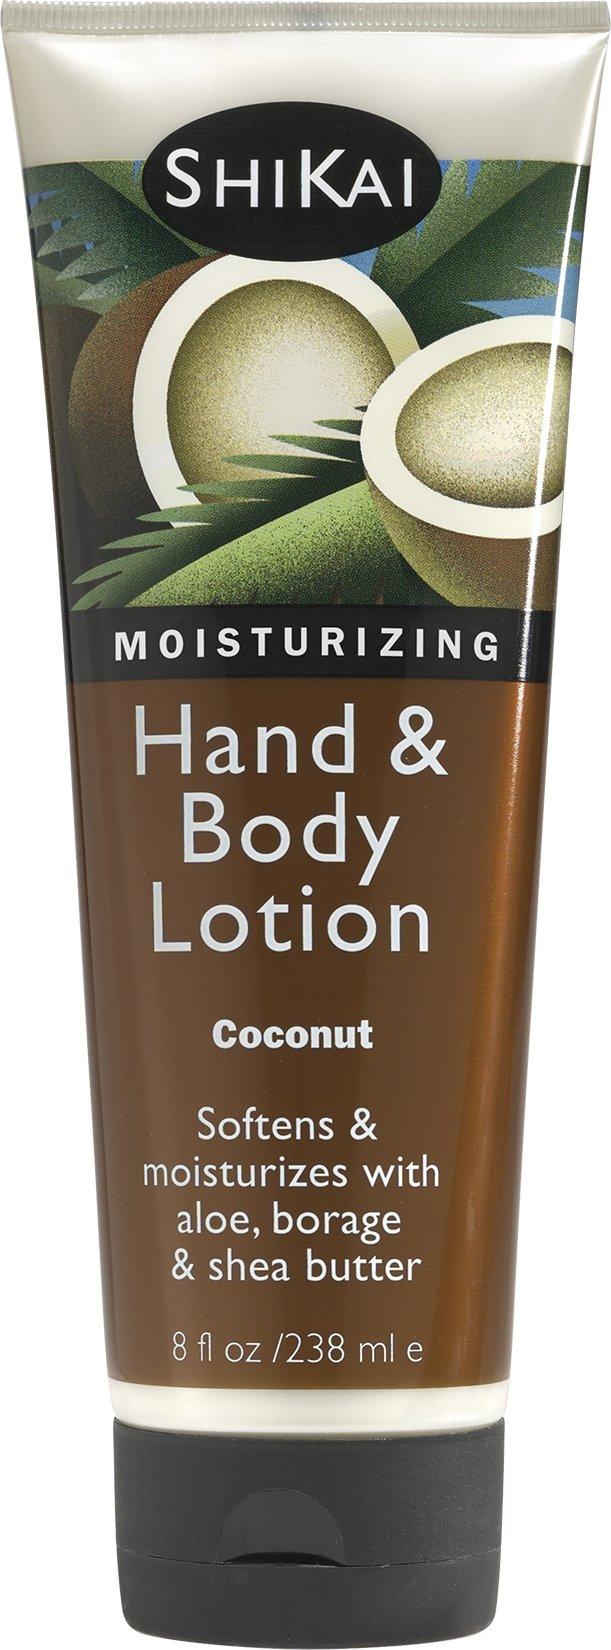 Shikai - Natural Moisturizing Hand & Body Lotion, Softens & Moisturizes Skin with Aloe Vera, Borage Oil & Shea Butter, Sensually Smooth Skin with Delicious Fragrances (Coconut, 8 Ounces)